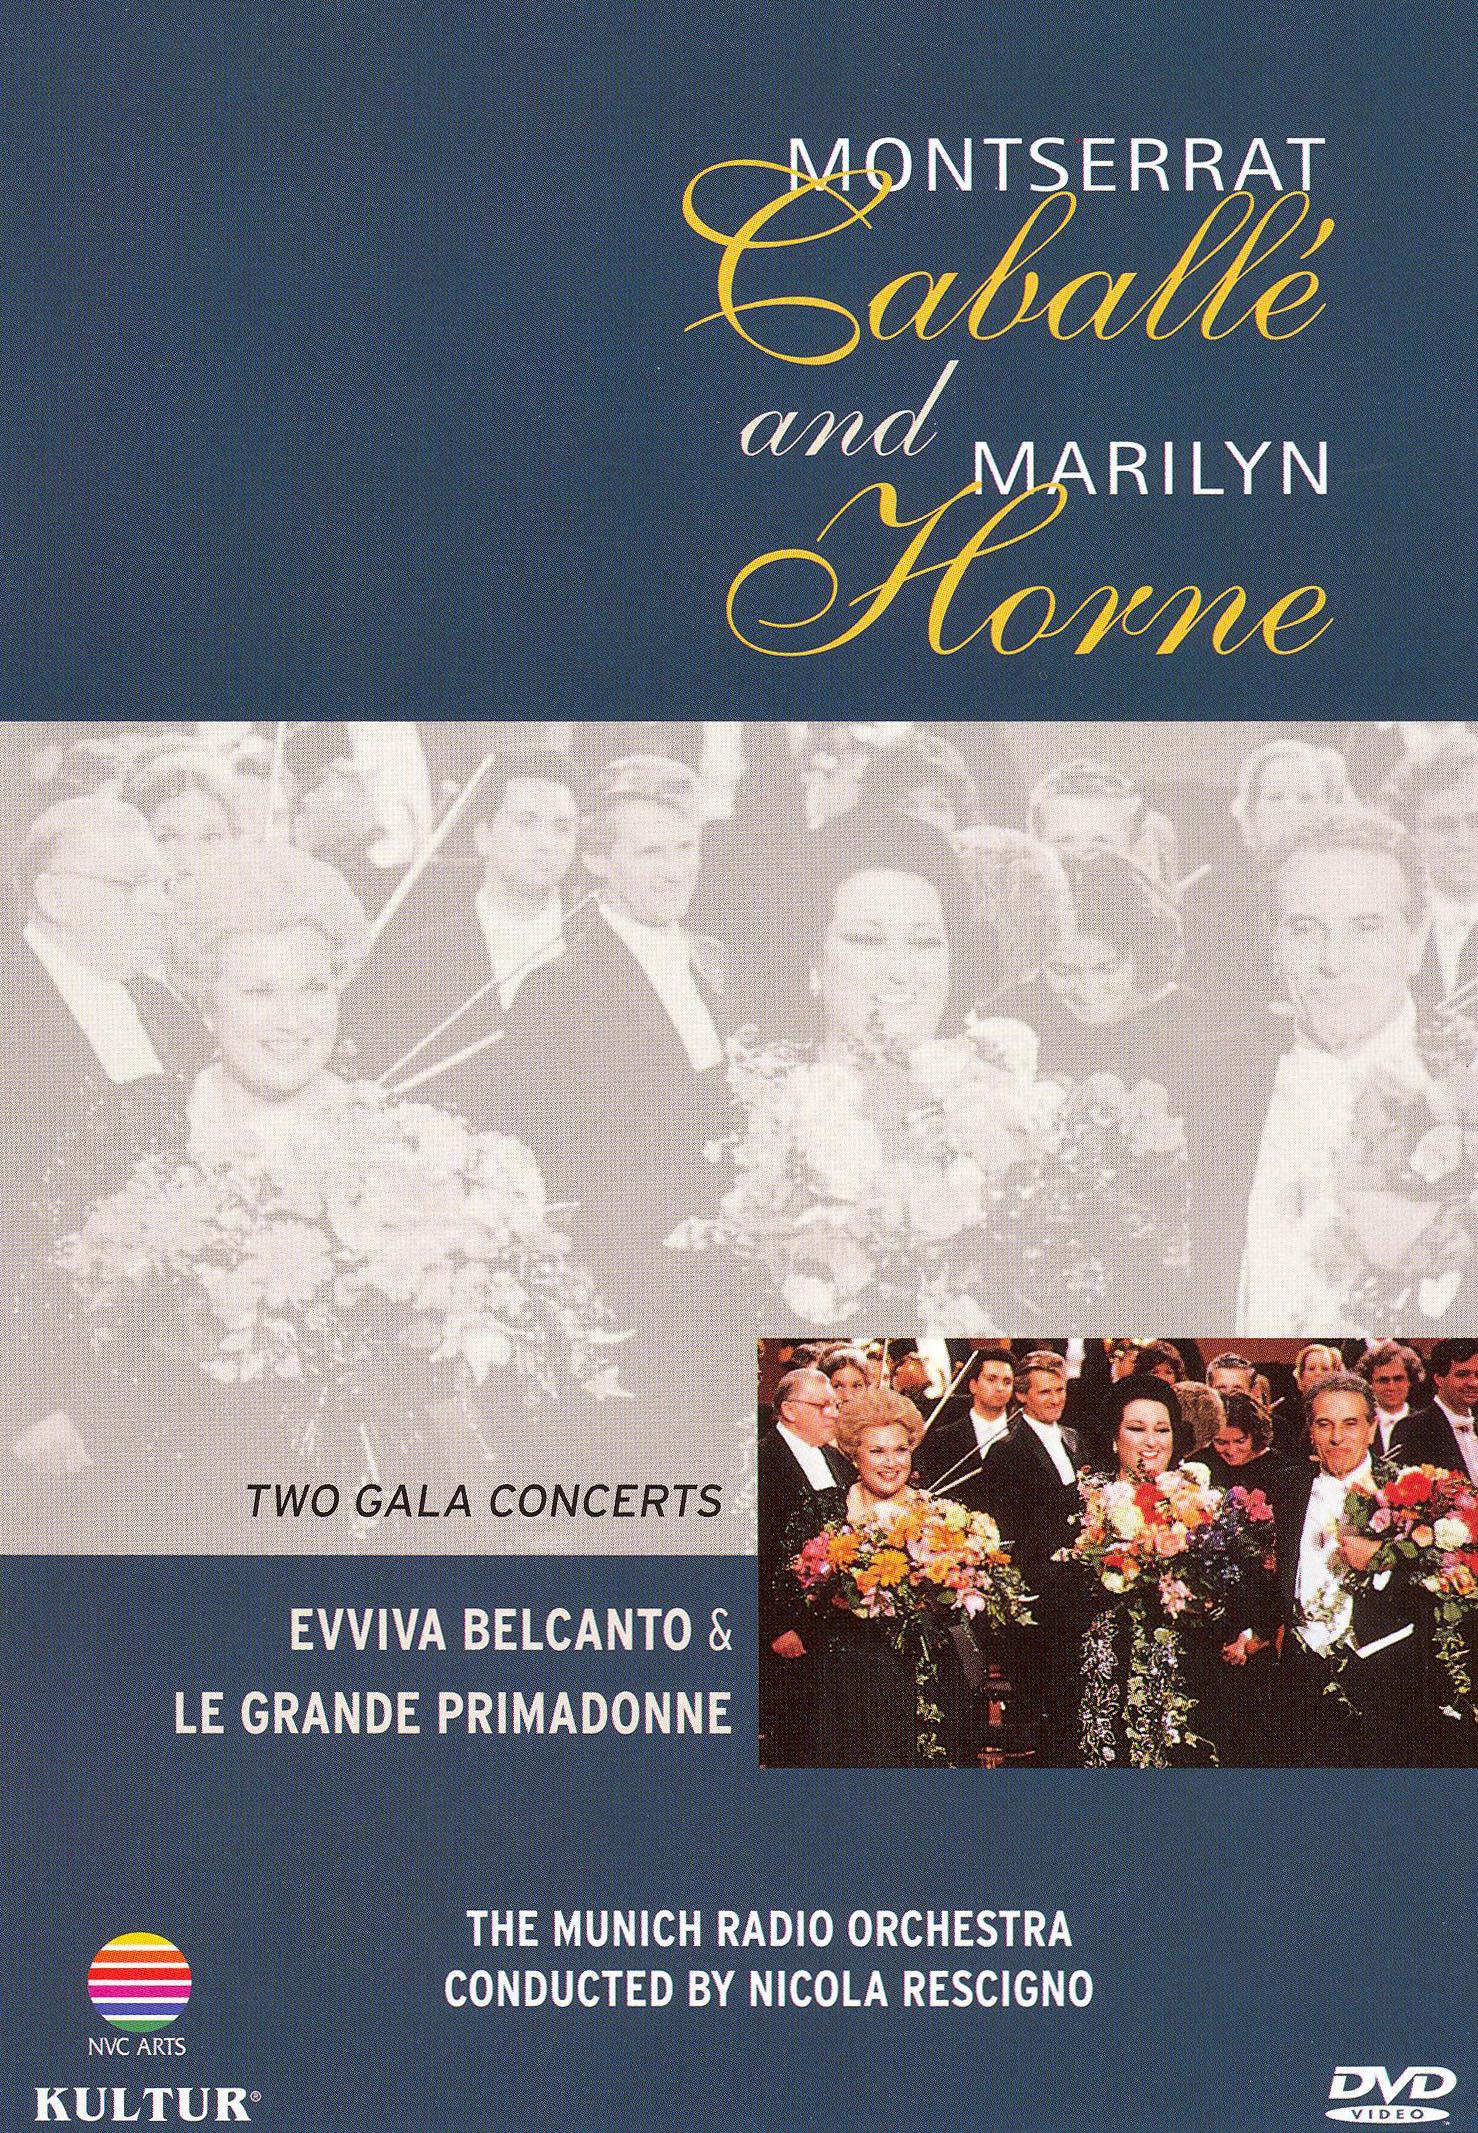 Montserrat Caballe & Marilyn Horne: Two Gala Concerts